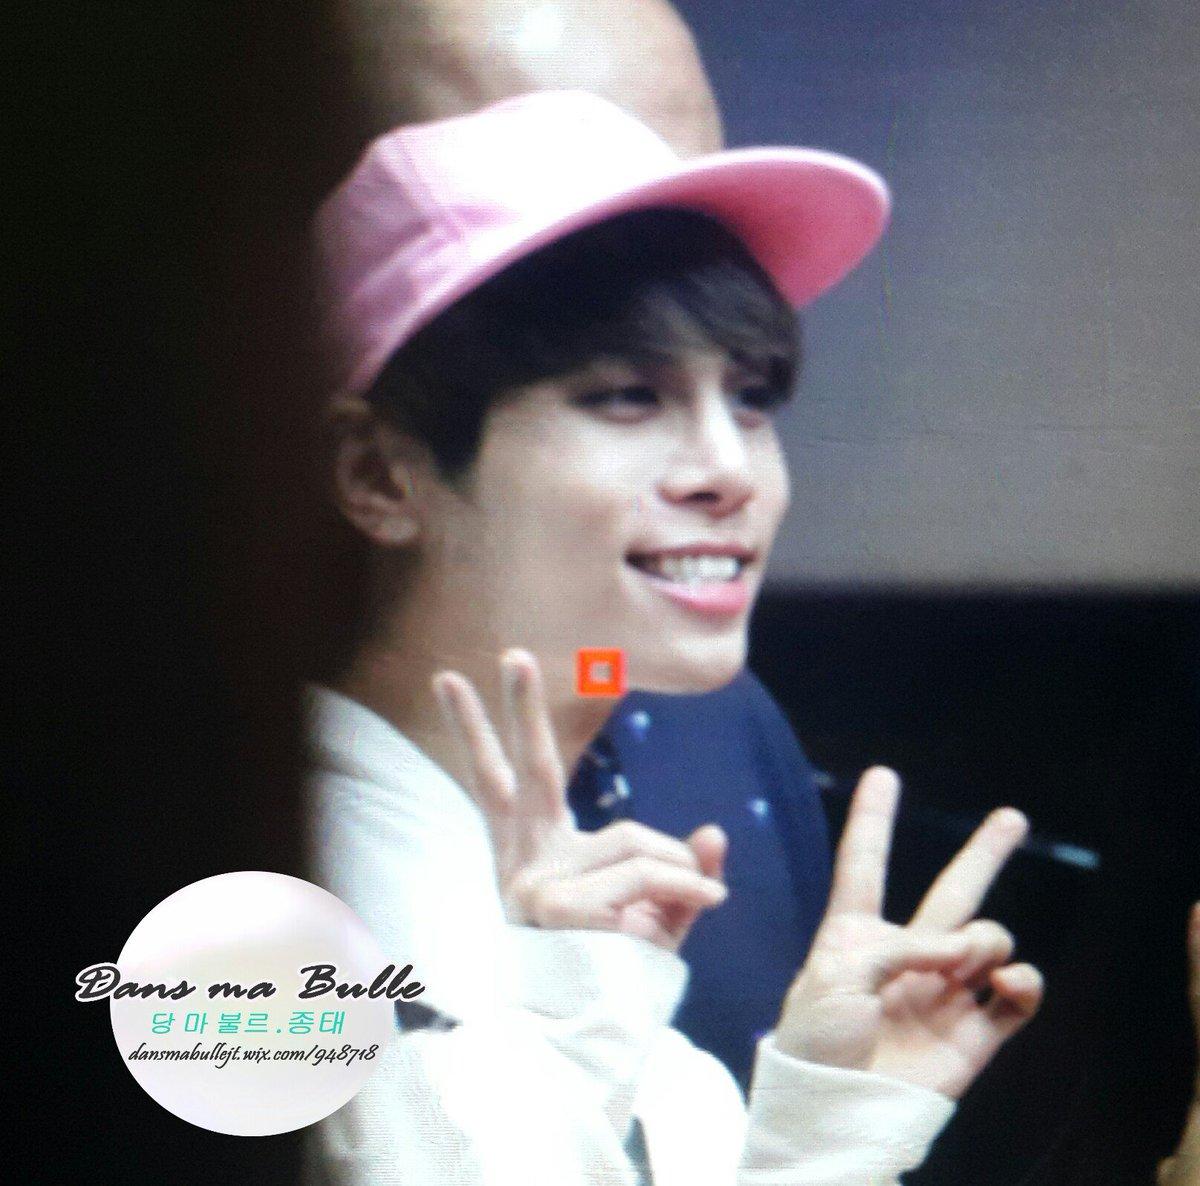 160415 Jonghyun @ MBC Blue Night CgGZrEsUkAEHj3h